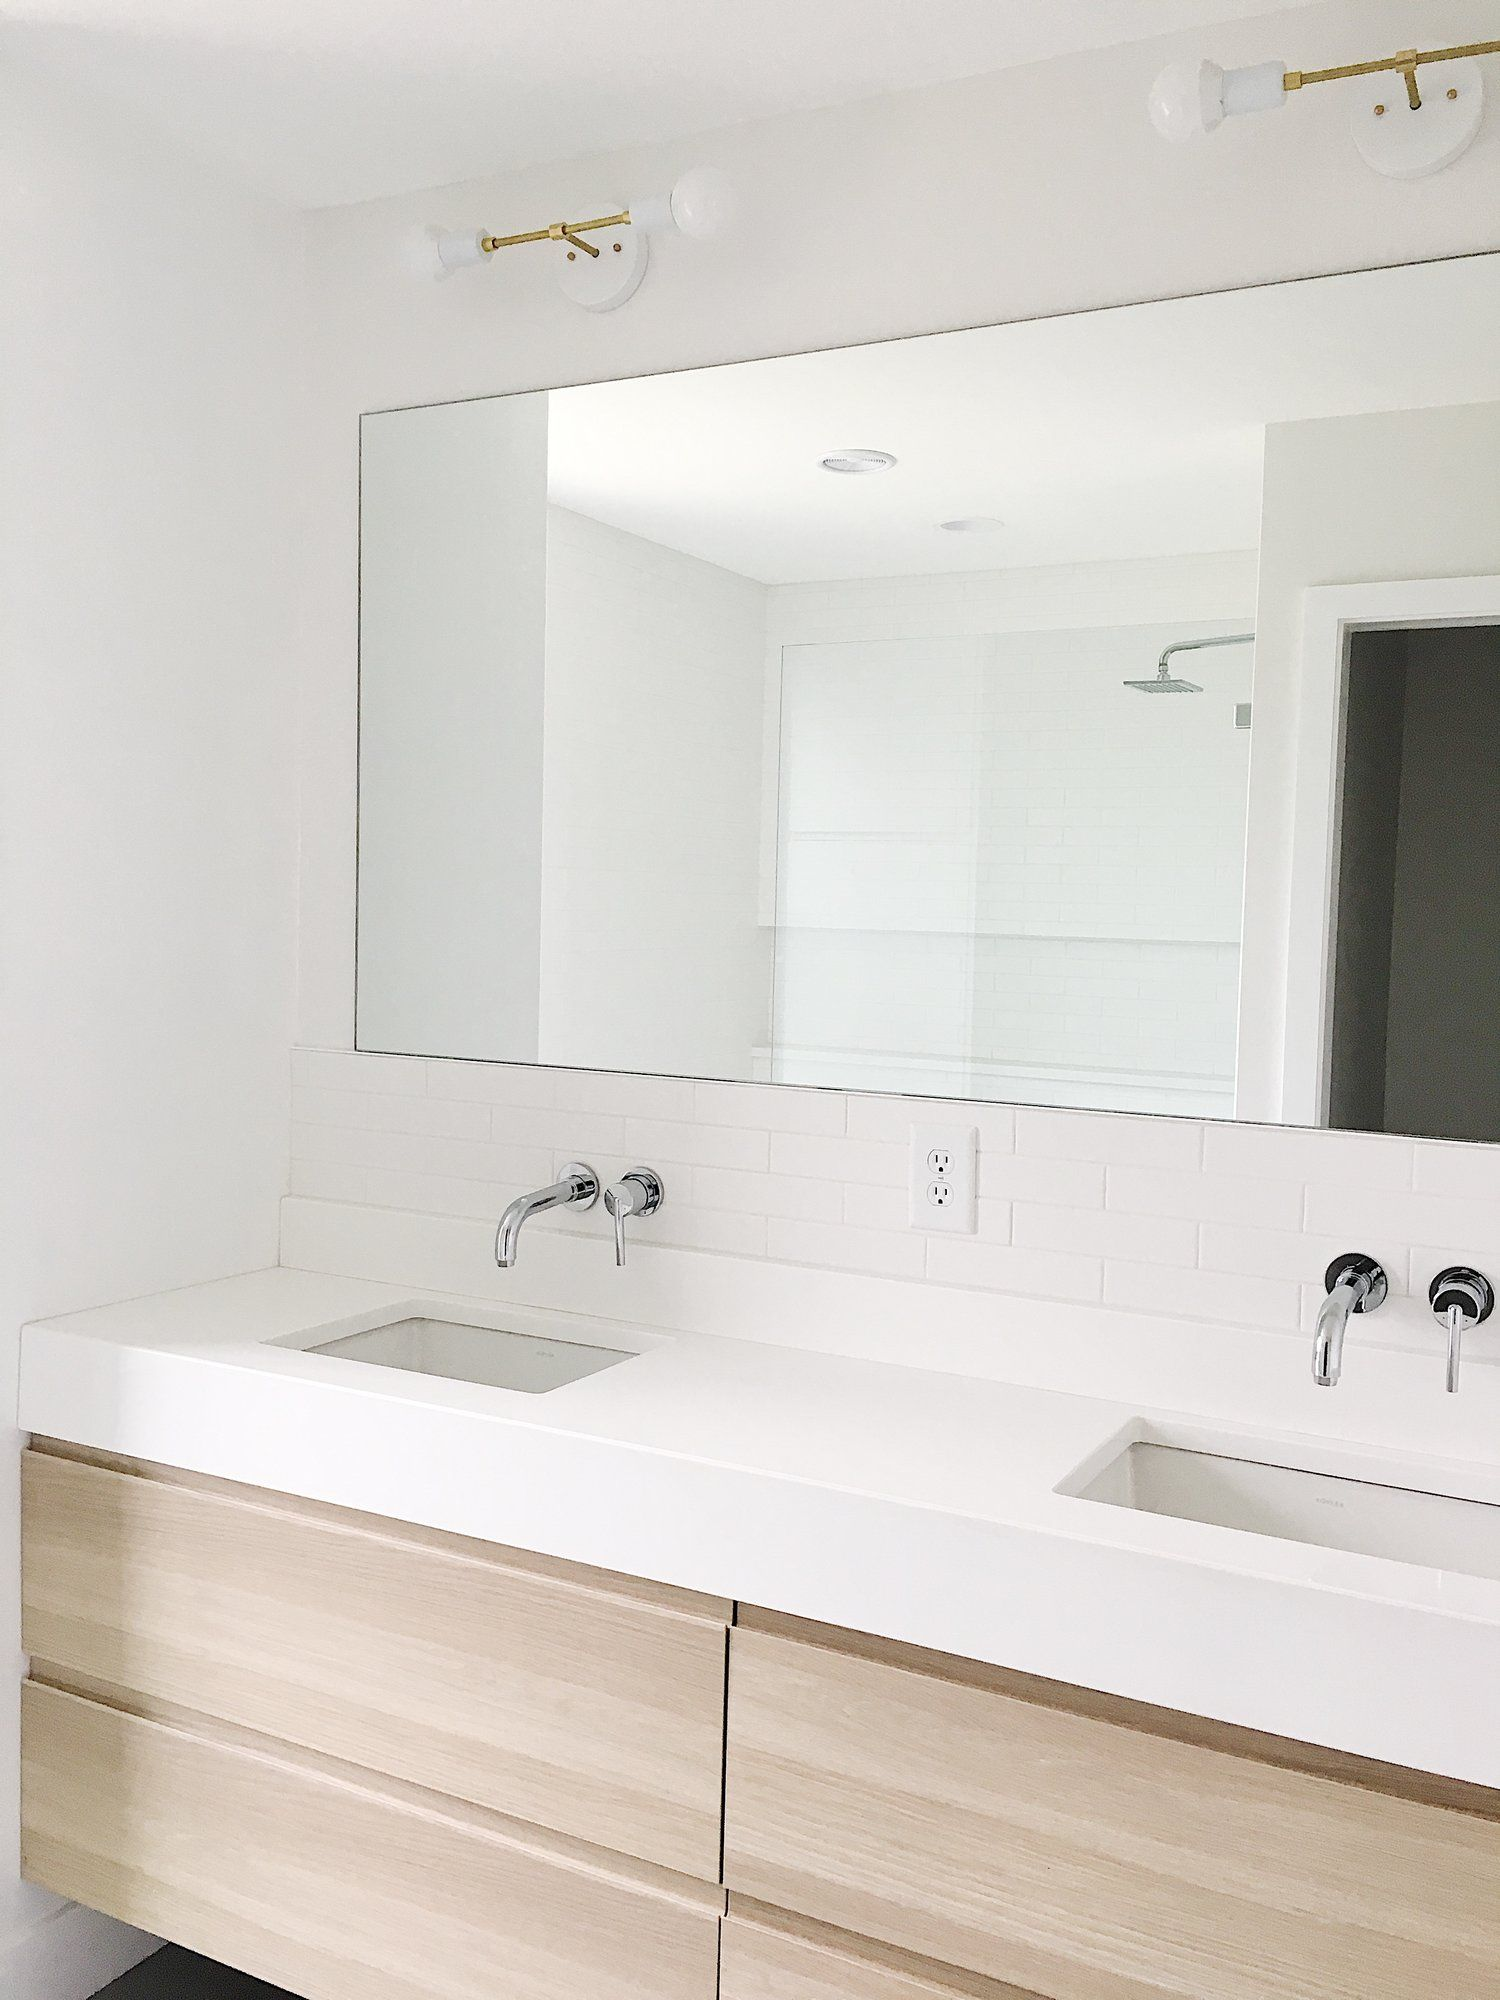 My Simply Simple Delta Faucet Beautiful Bathrooms Pinterest Pin Bathroom Parts Diagram On